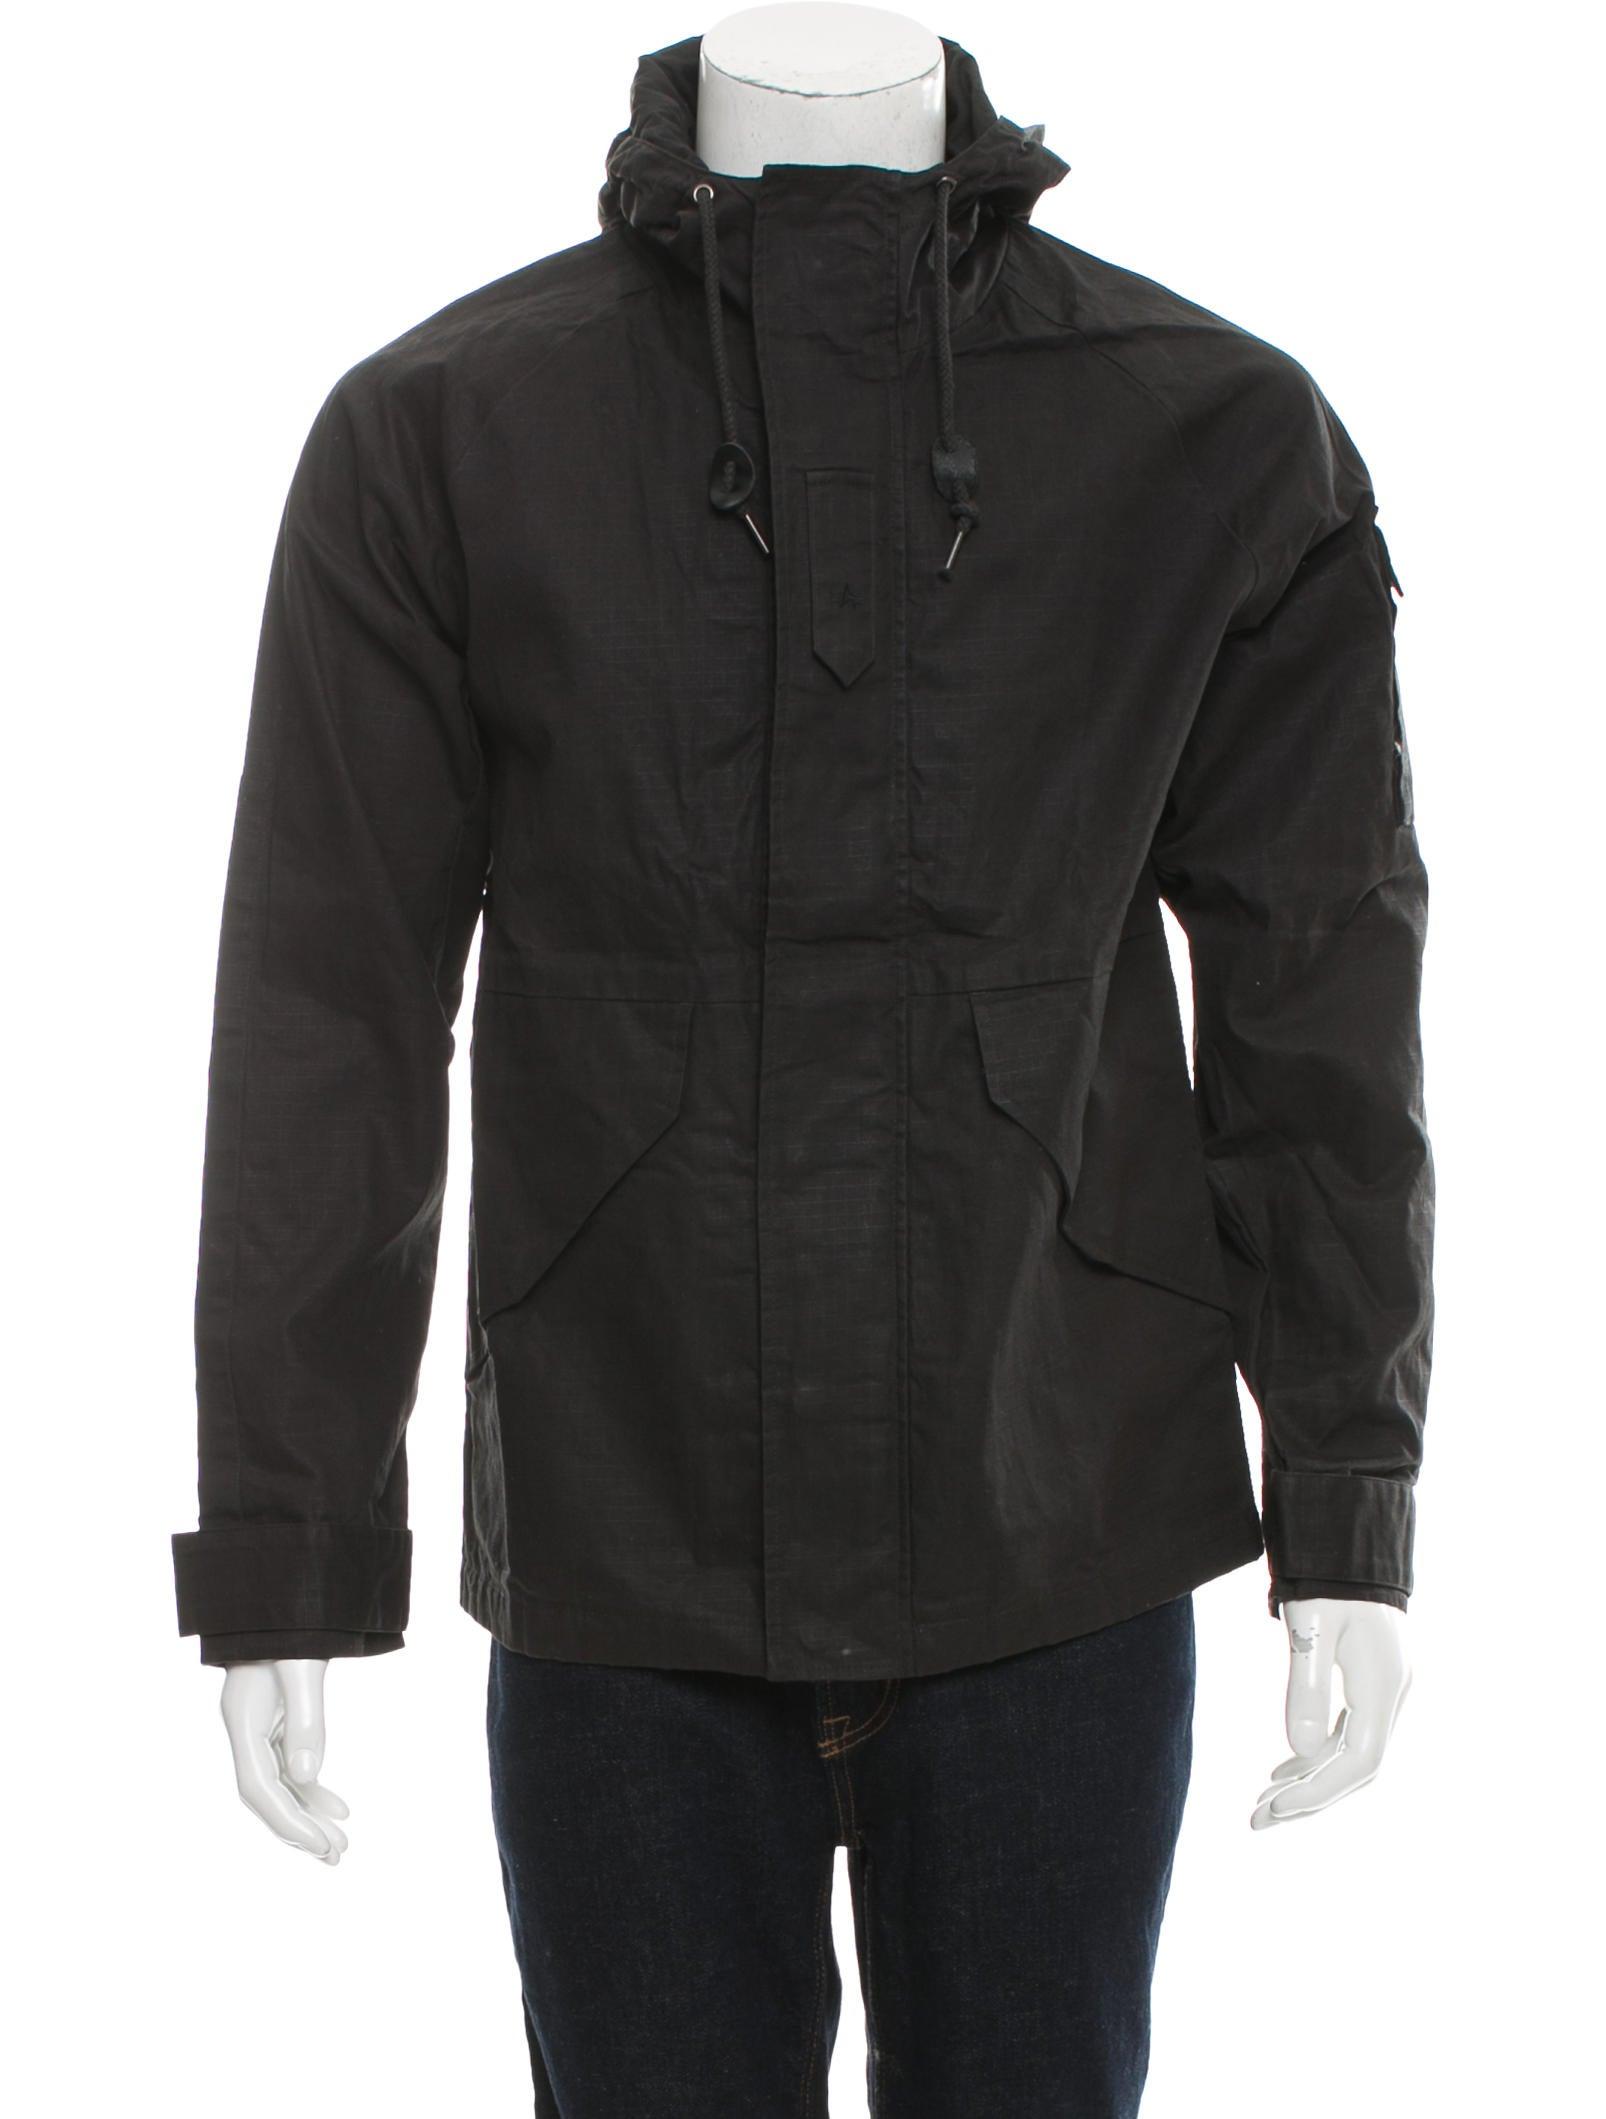 alpha industries hooded parka coat w tags clothing. Black Bedroom Furniture Sets. Home Design Ideas